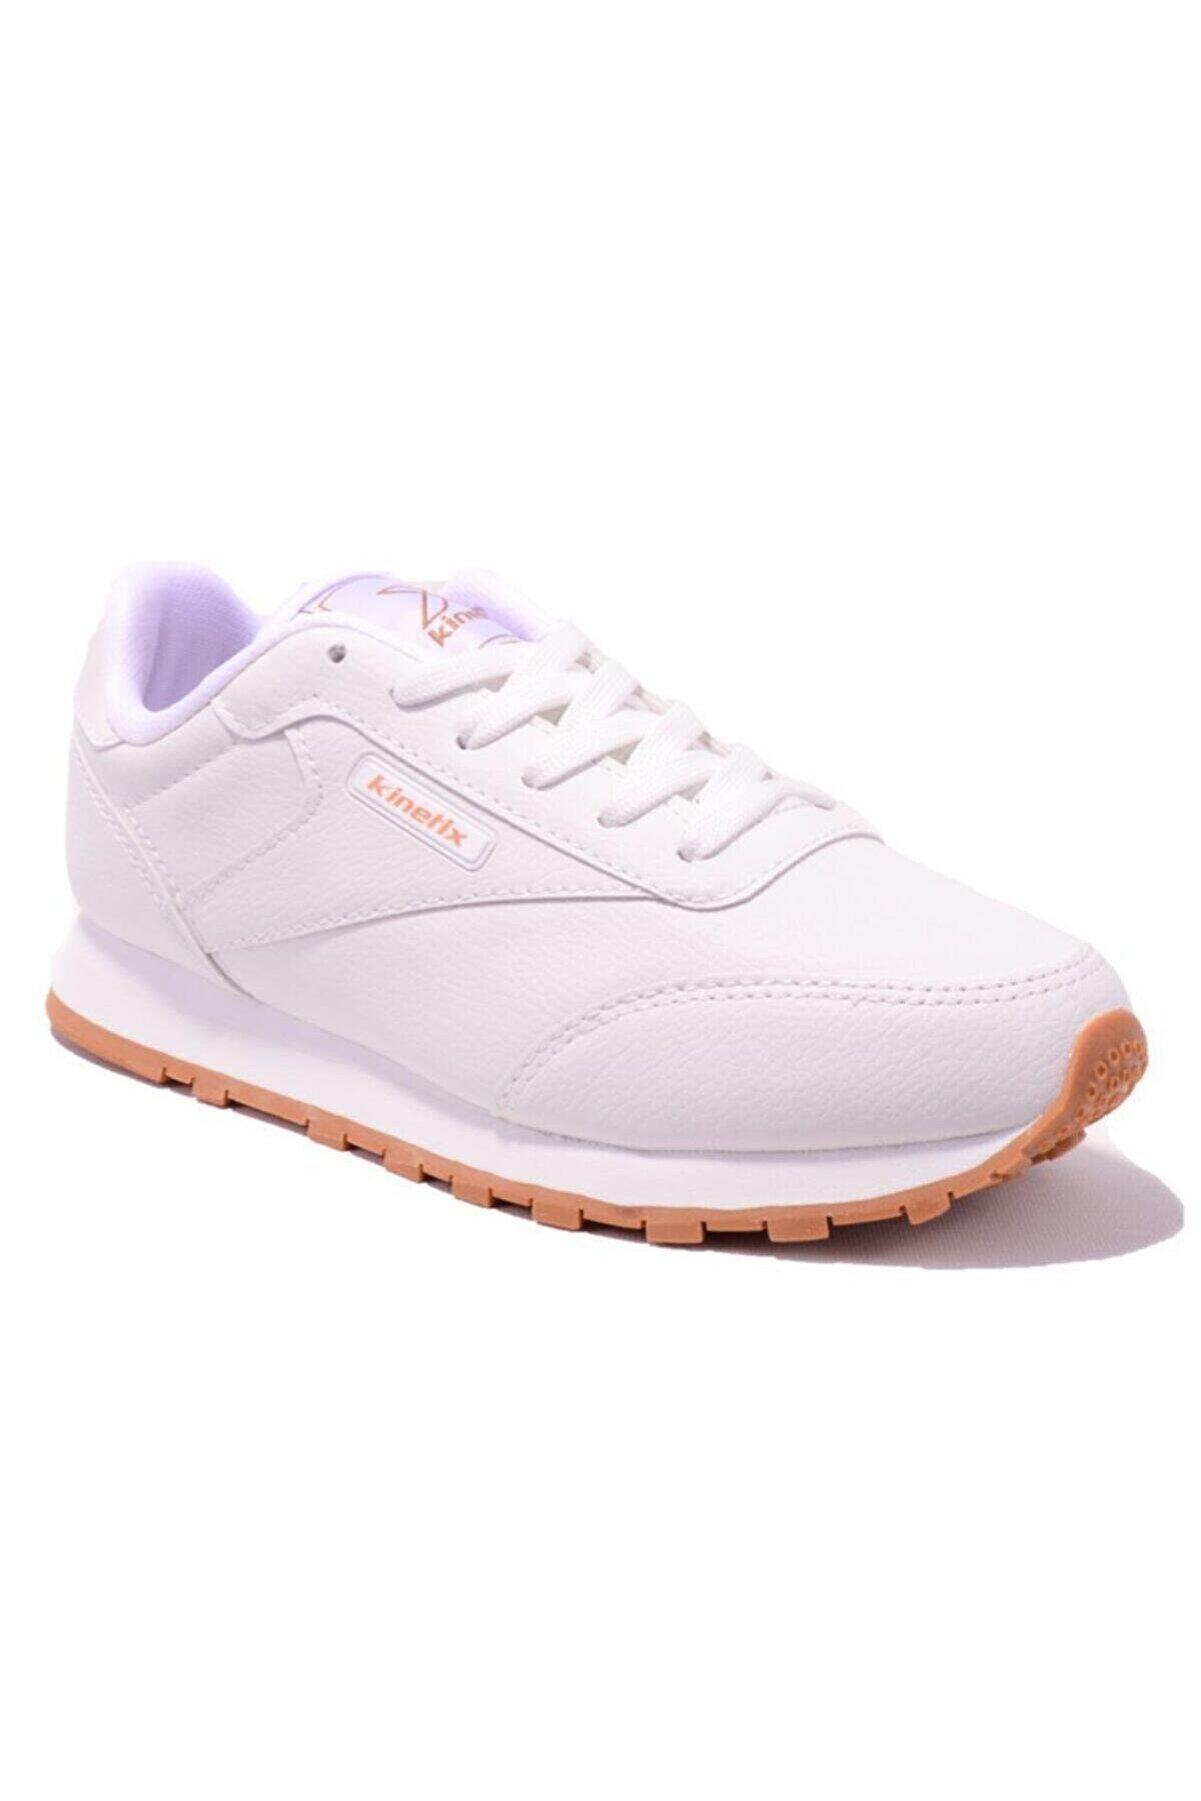 Kinetix LOWER PU W Beyaz GUM Kadın Sneaker 100310002